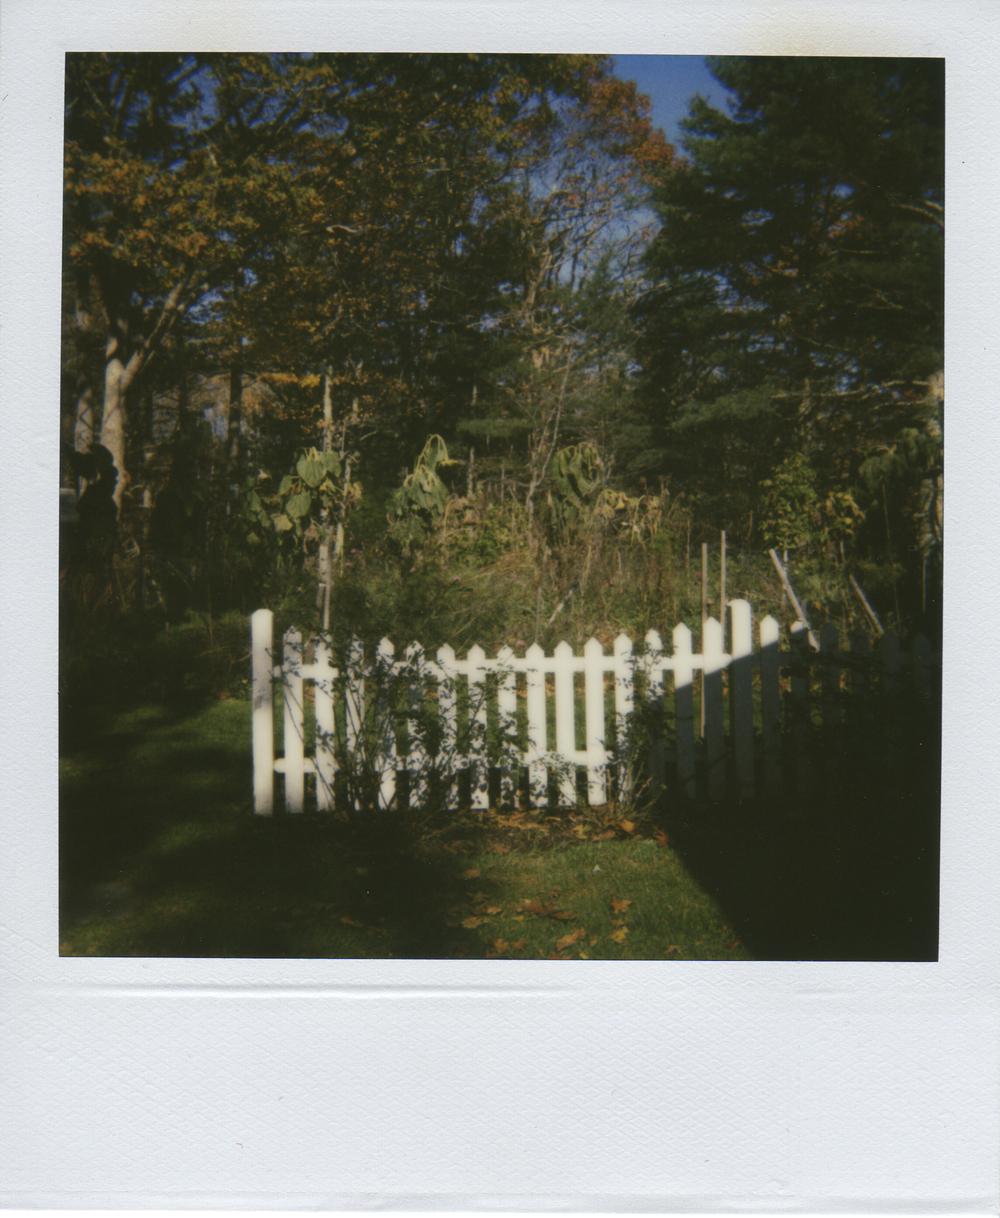 jlaurence-polaroid-133.jpg